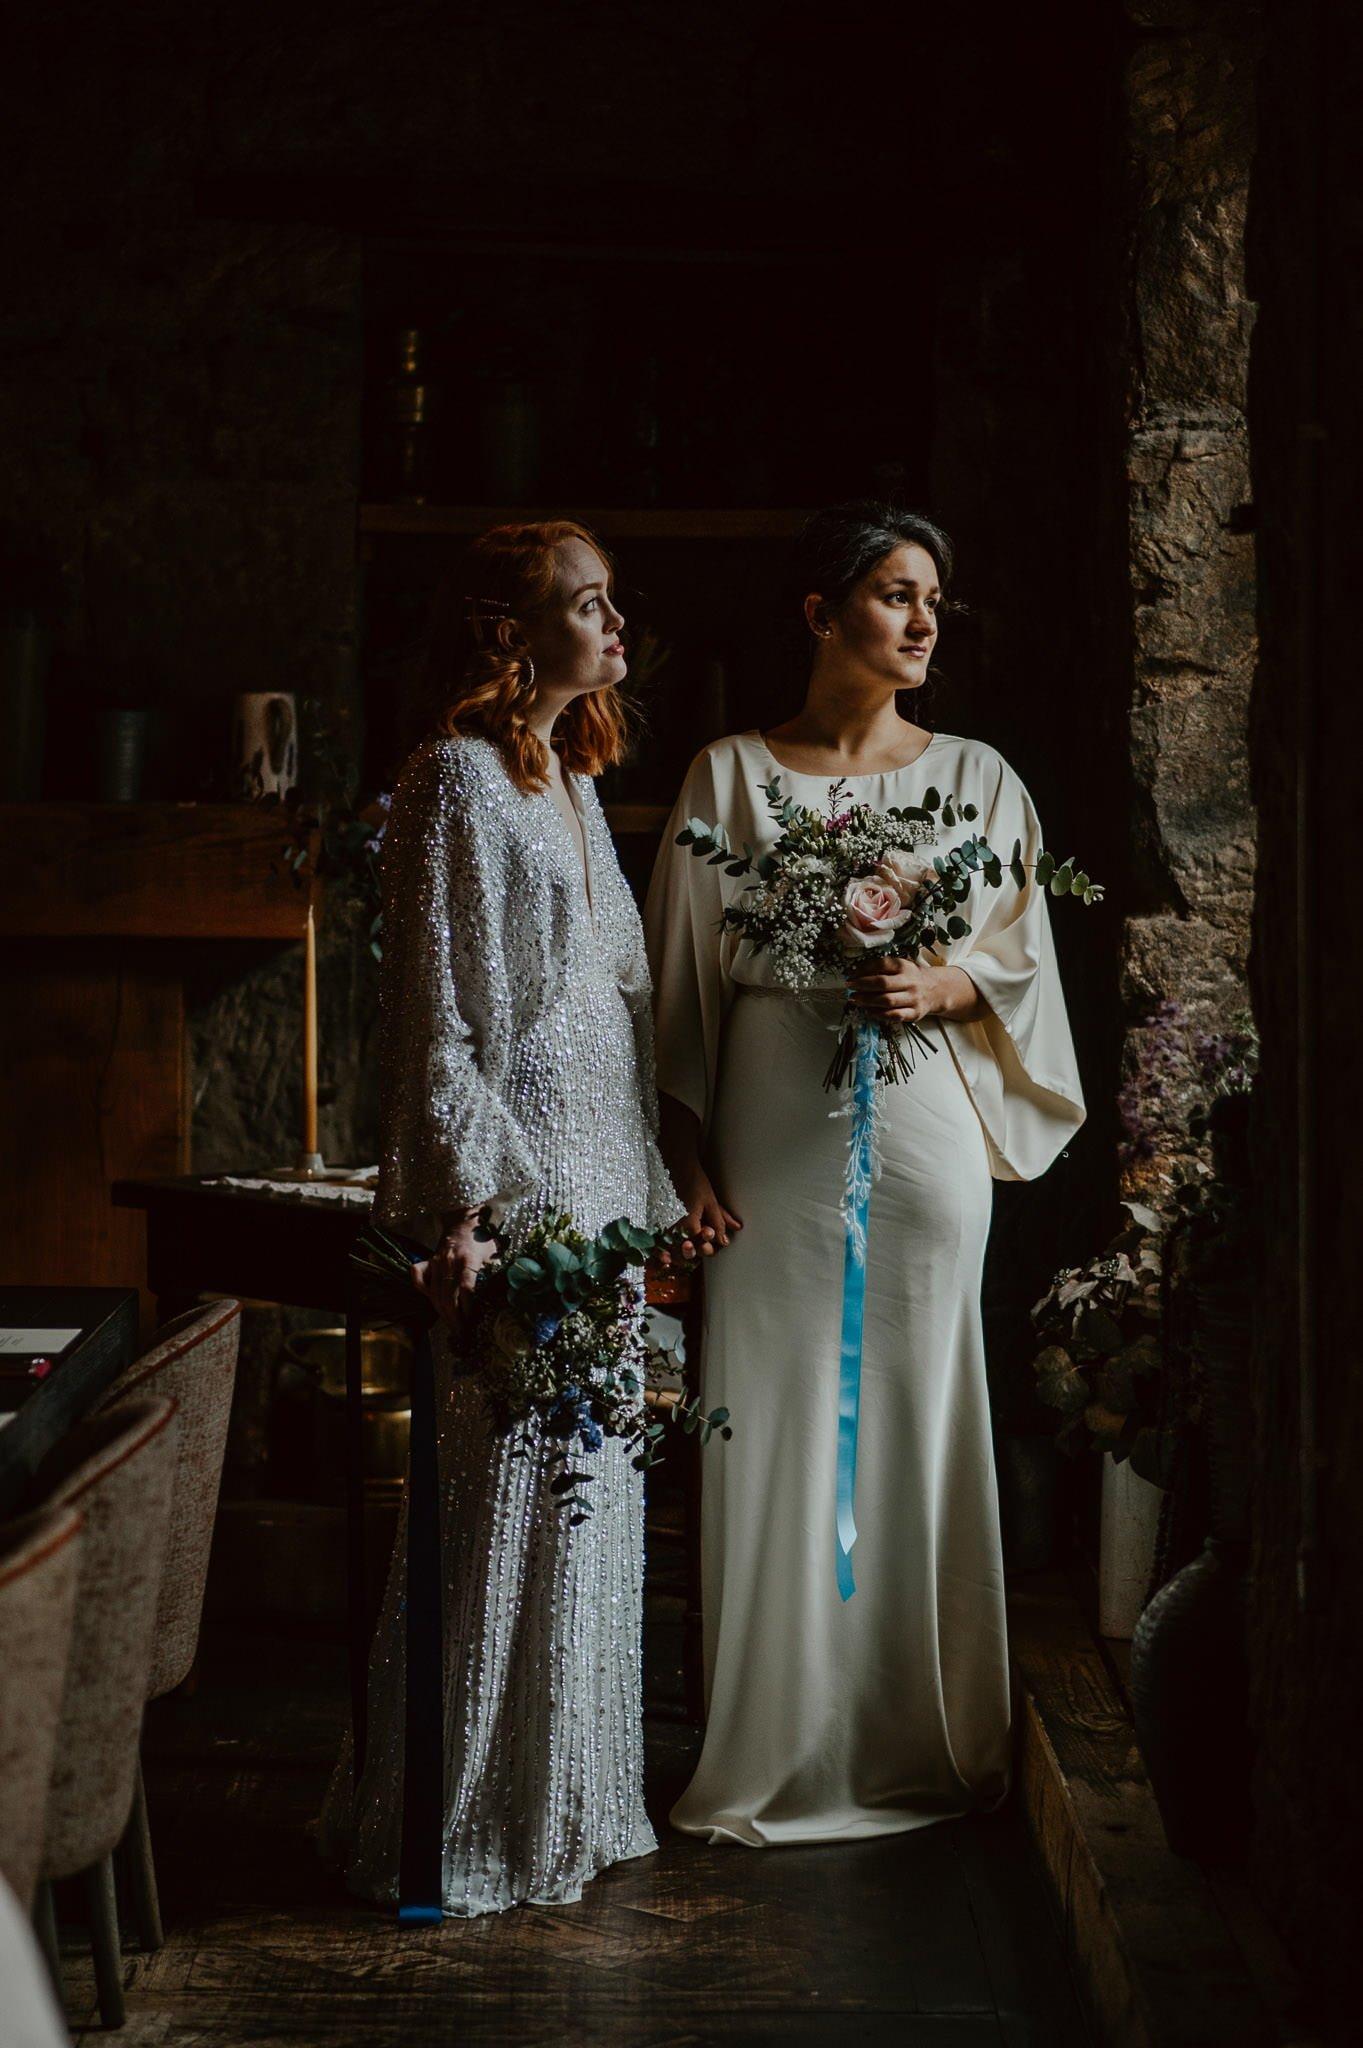 A Dreamy Pre-Raphaelite Wedding at the Bothy in Glasgow 8